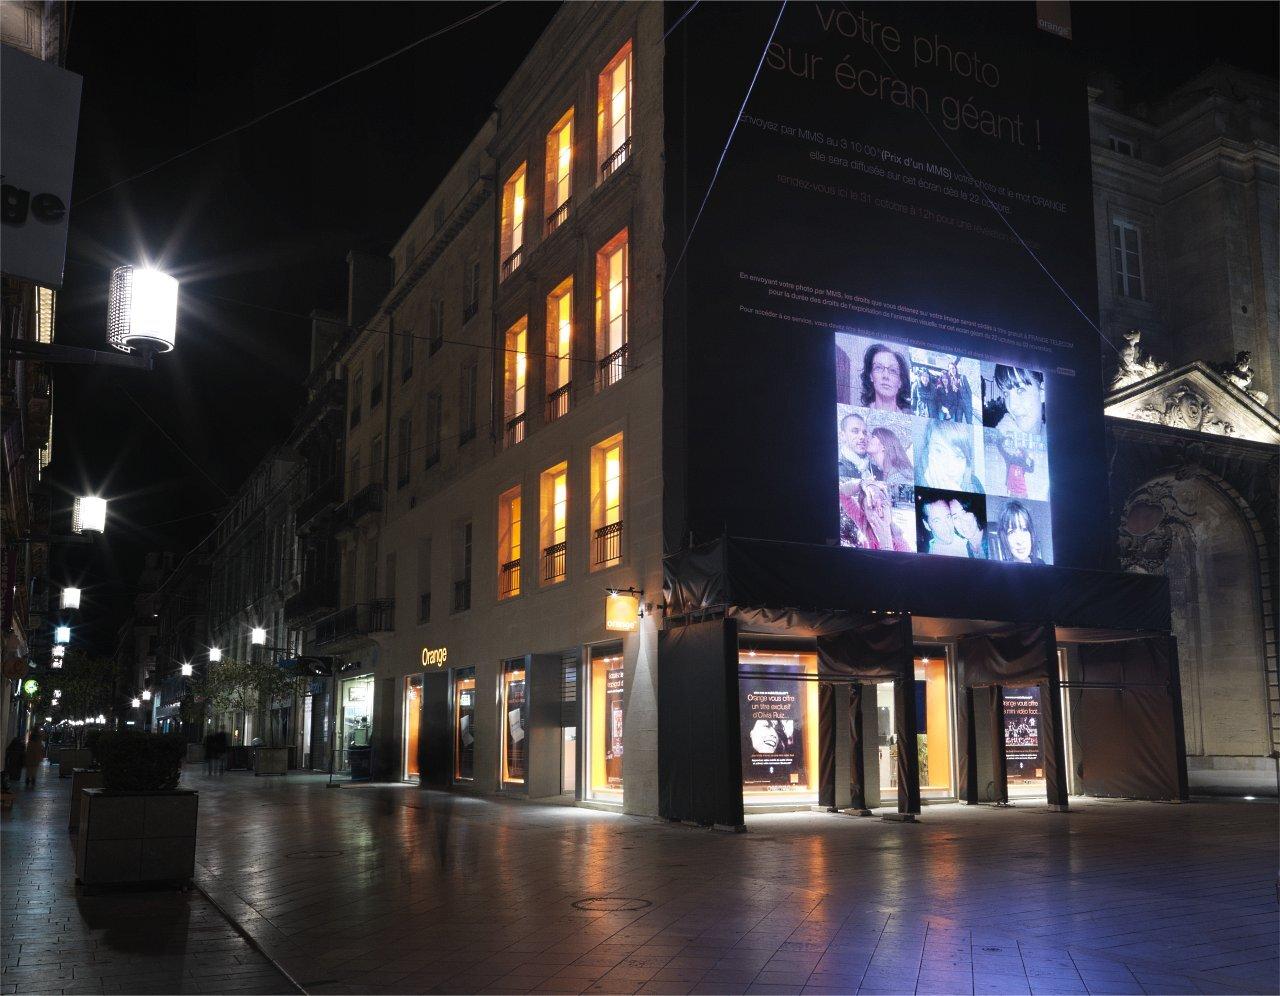 boutique orange rue sainte catherine bordeaux. Black Bedroom Furniture Sets. Home Design Ideas